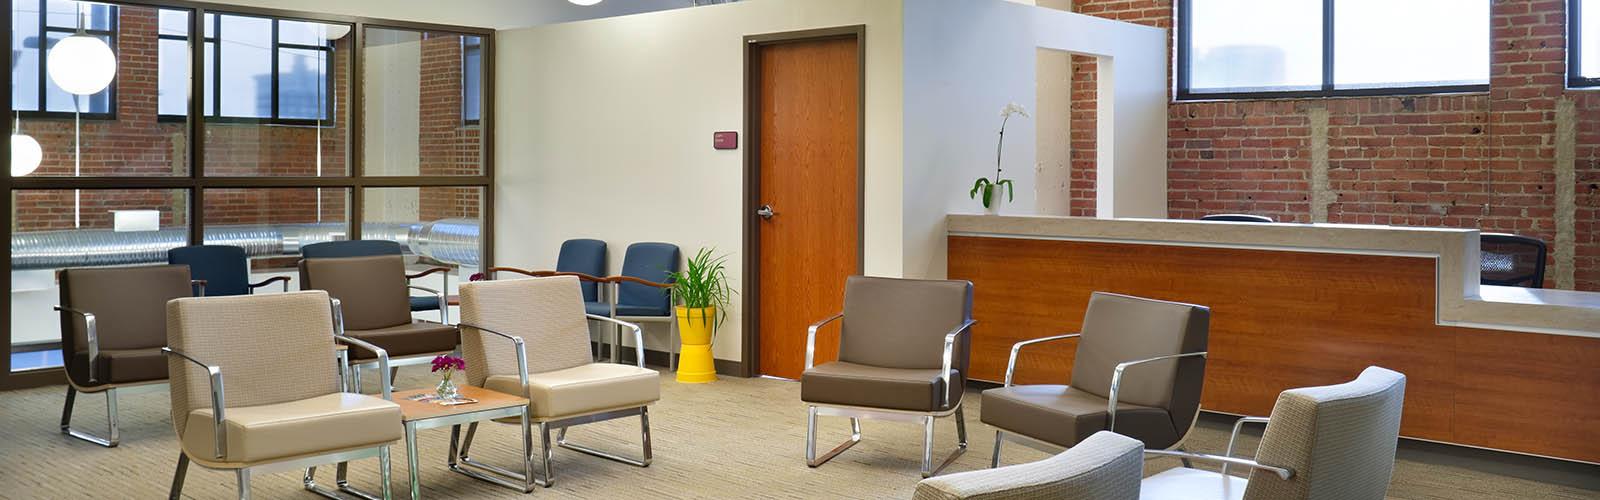 Truman Medical Center Behavioral Health Clinic 3